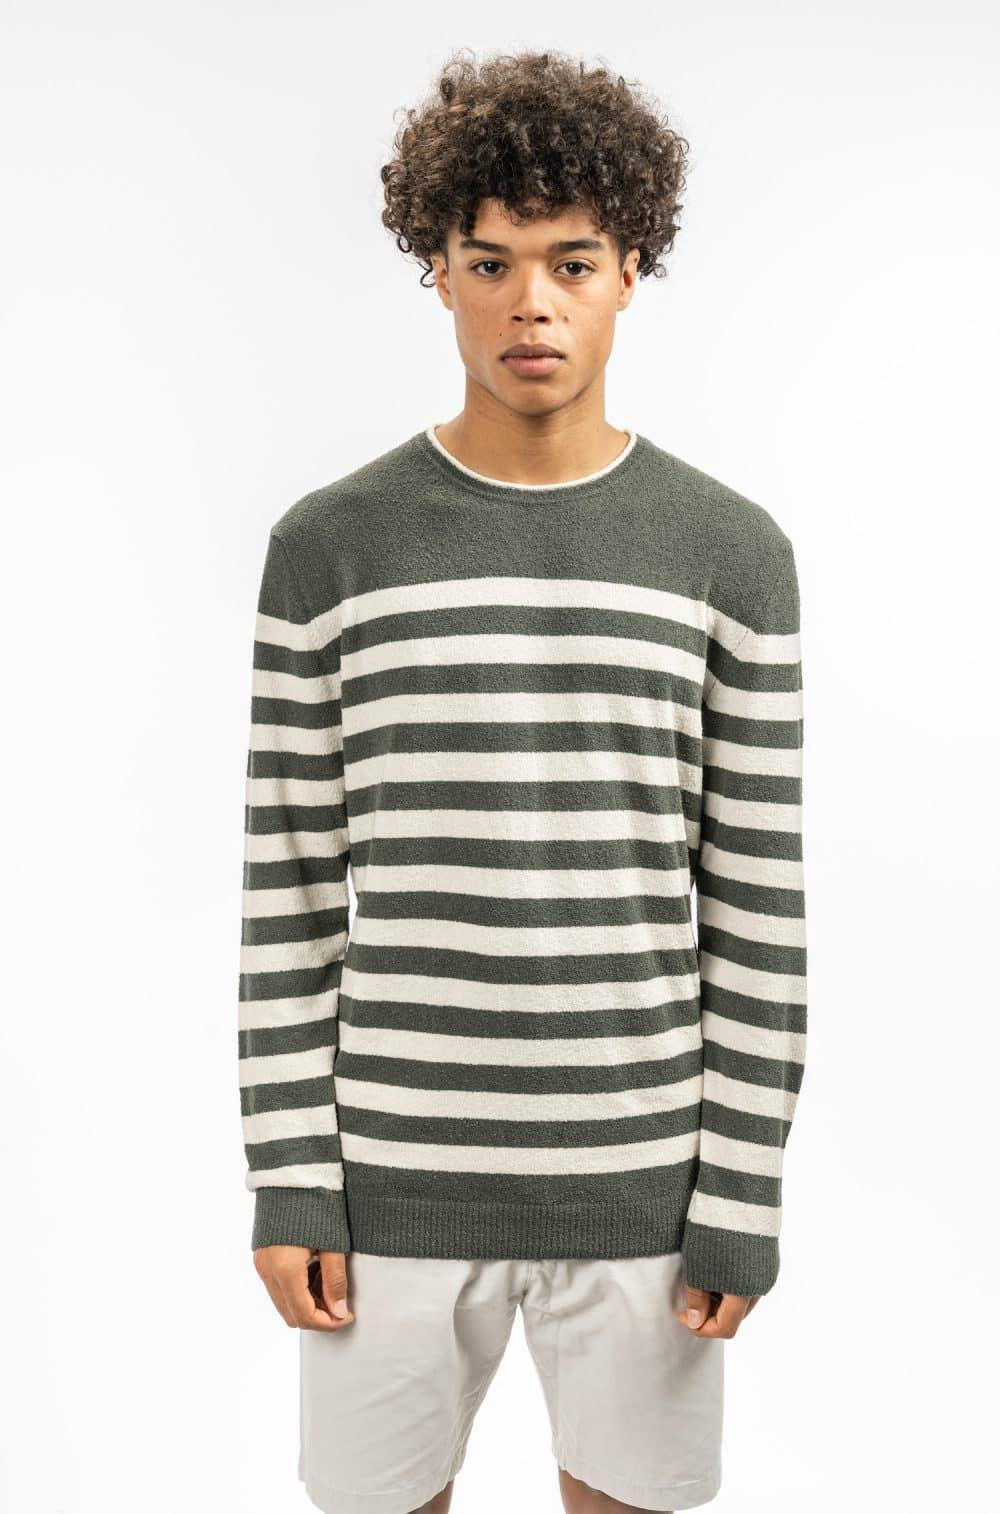 castart knitwear khaki white stripes SS19 Colorful & qualitative Castart knitwear - shop castart men's clothing